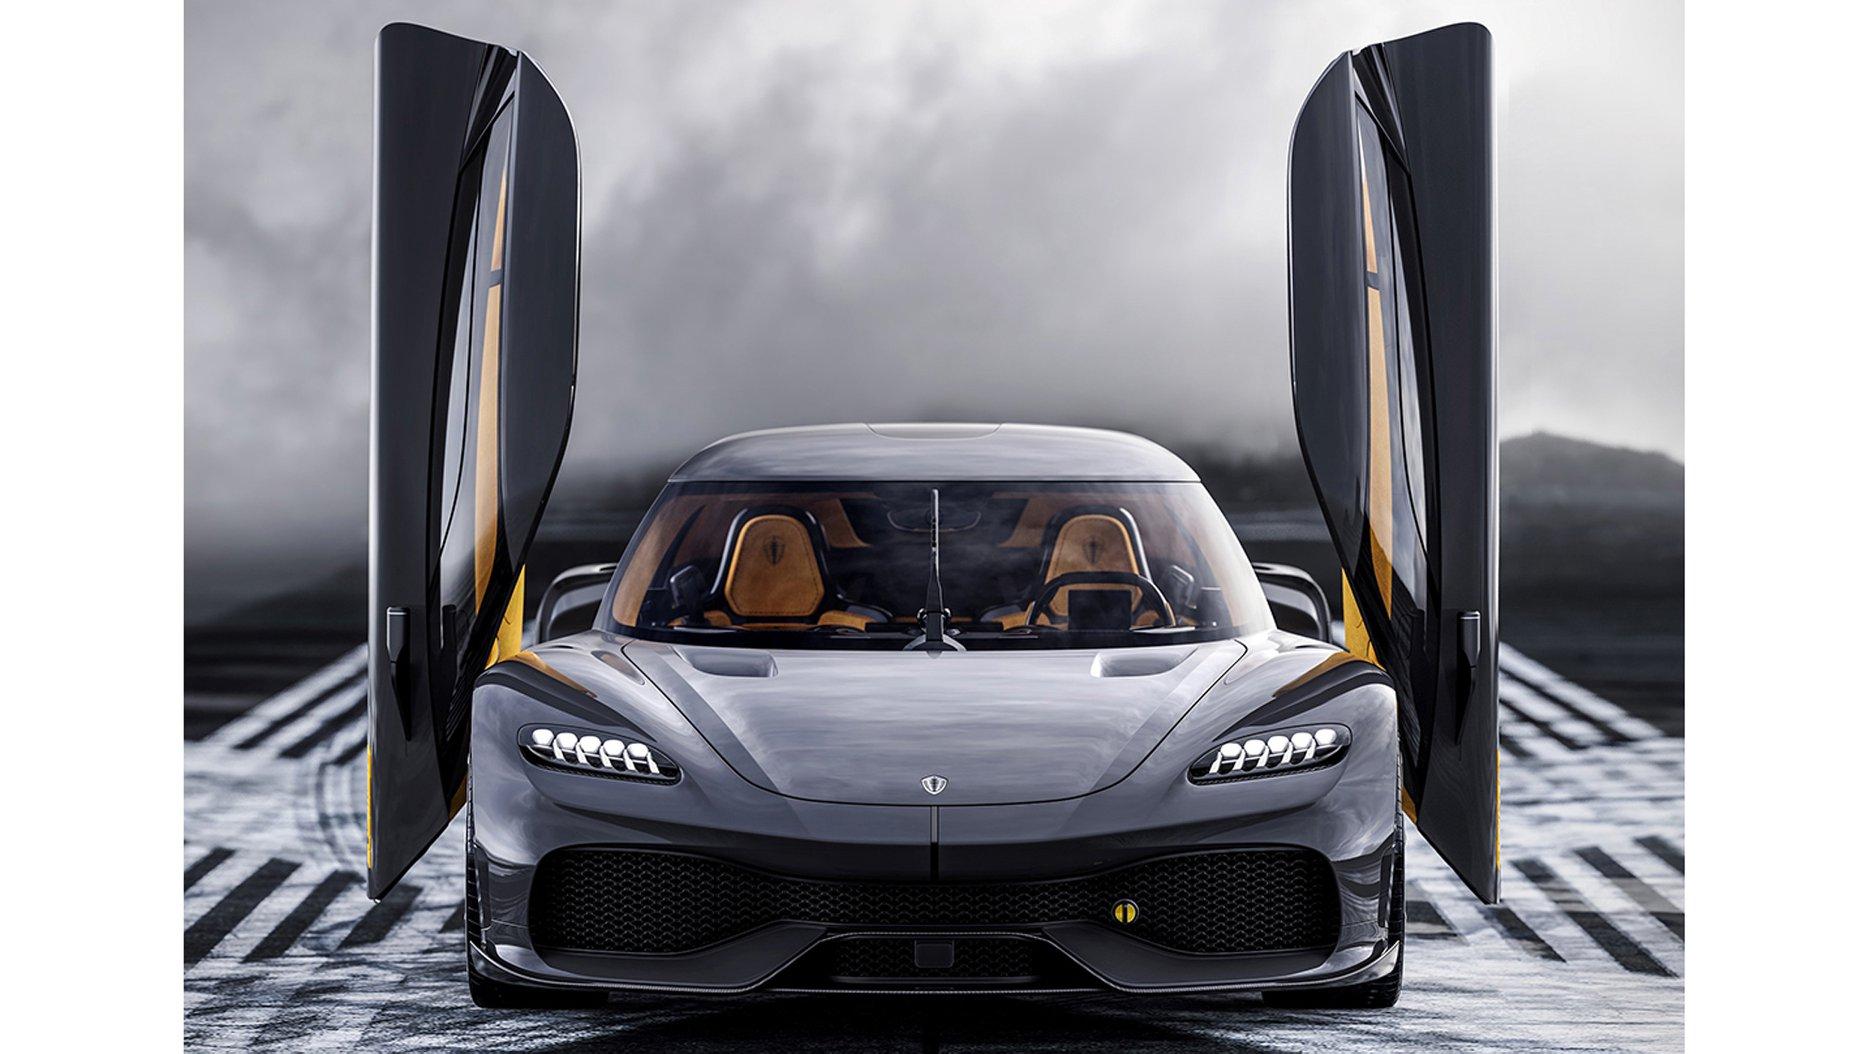 Koenigsegg Gemera GIMS 2020 - OPEN